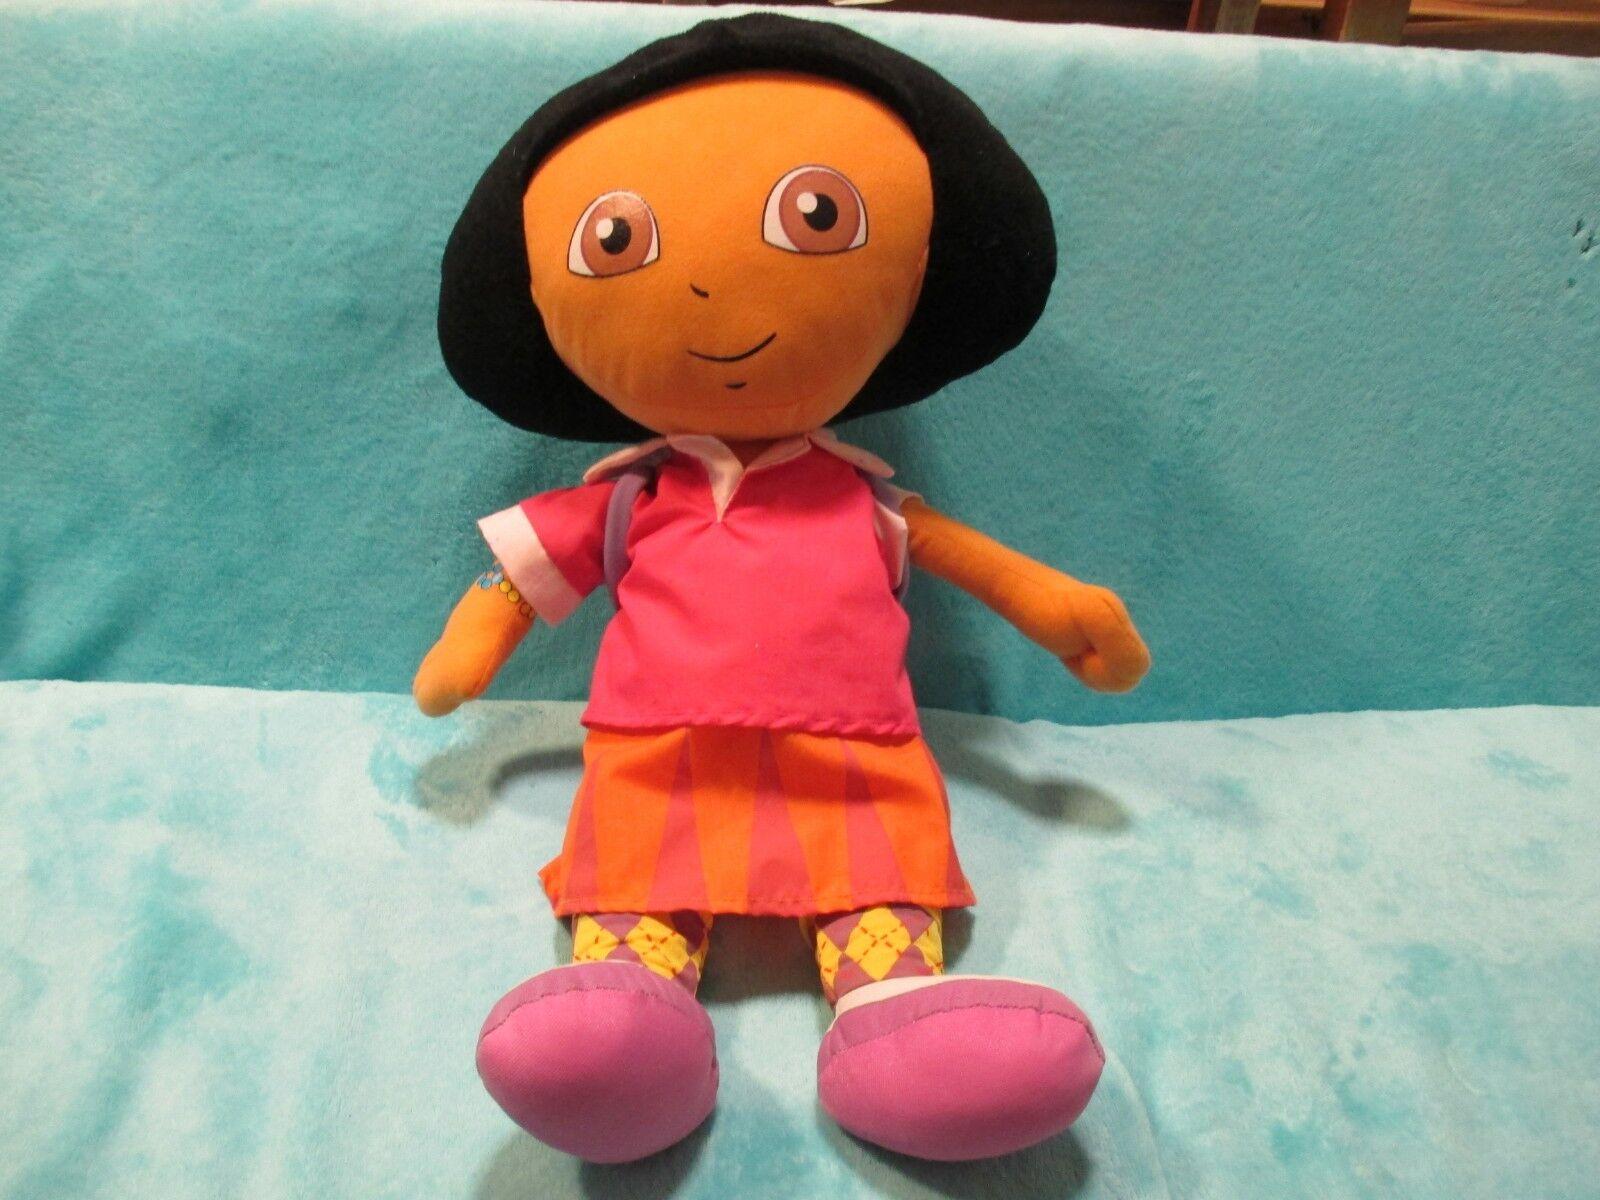 2009 Play By Play Dora The Explorer - LARGE Soft Plush Jumbo Toy 19  XMAS GIFT